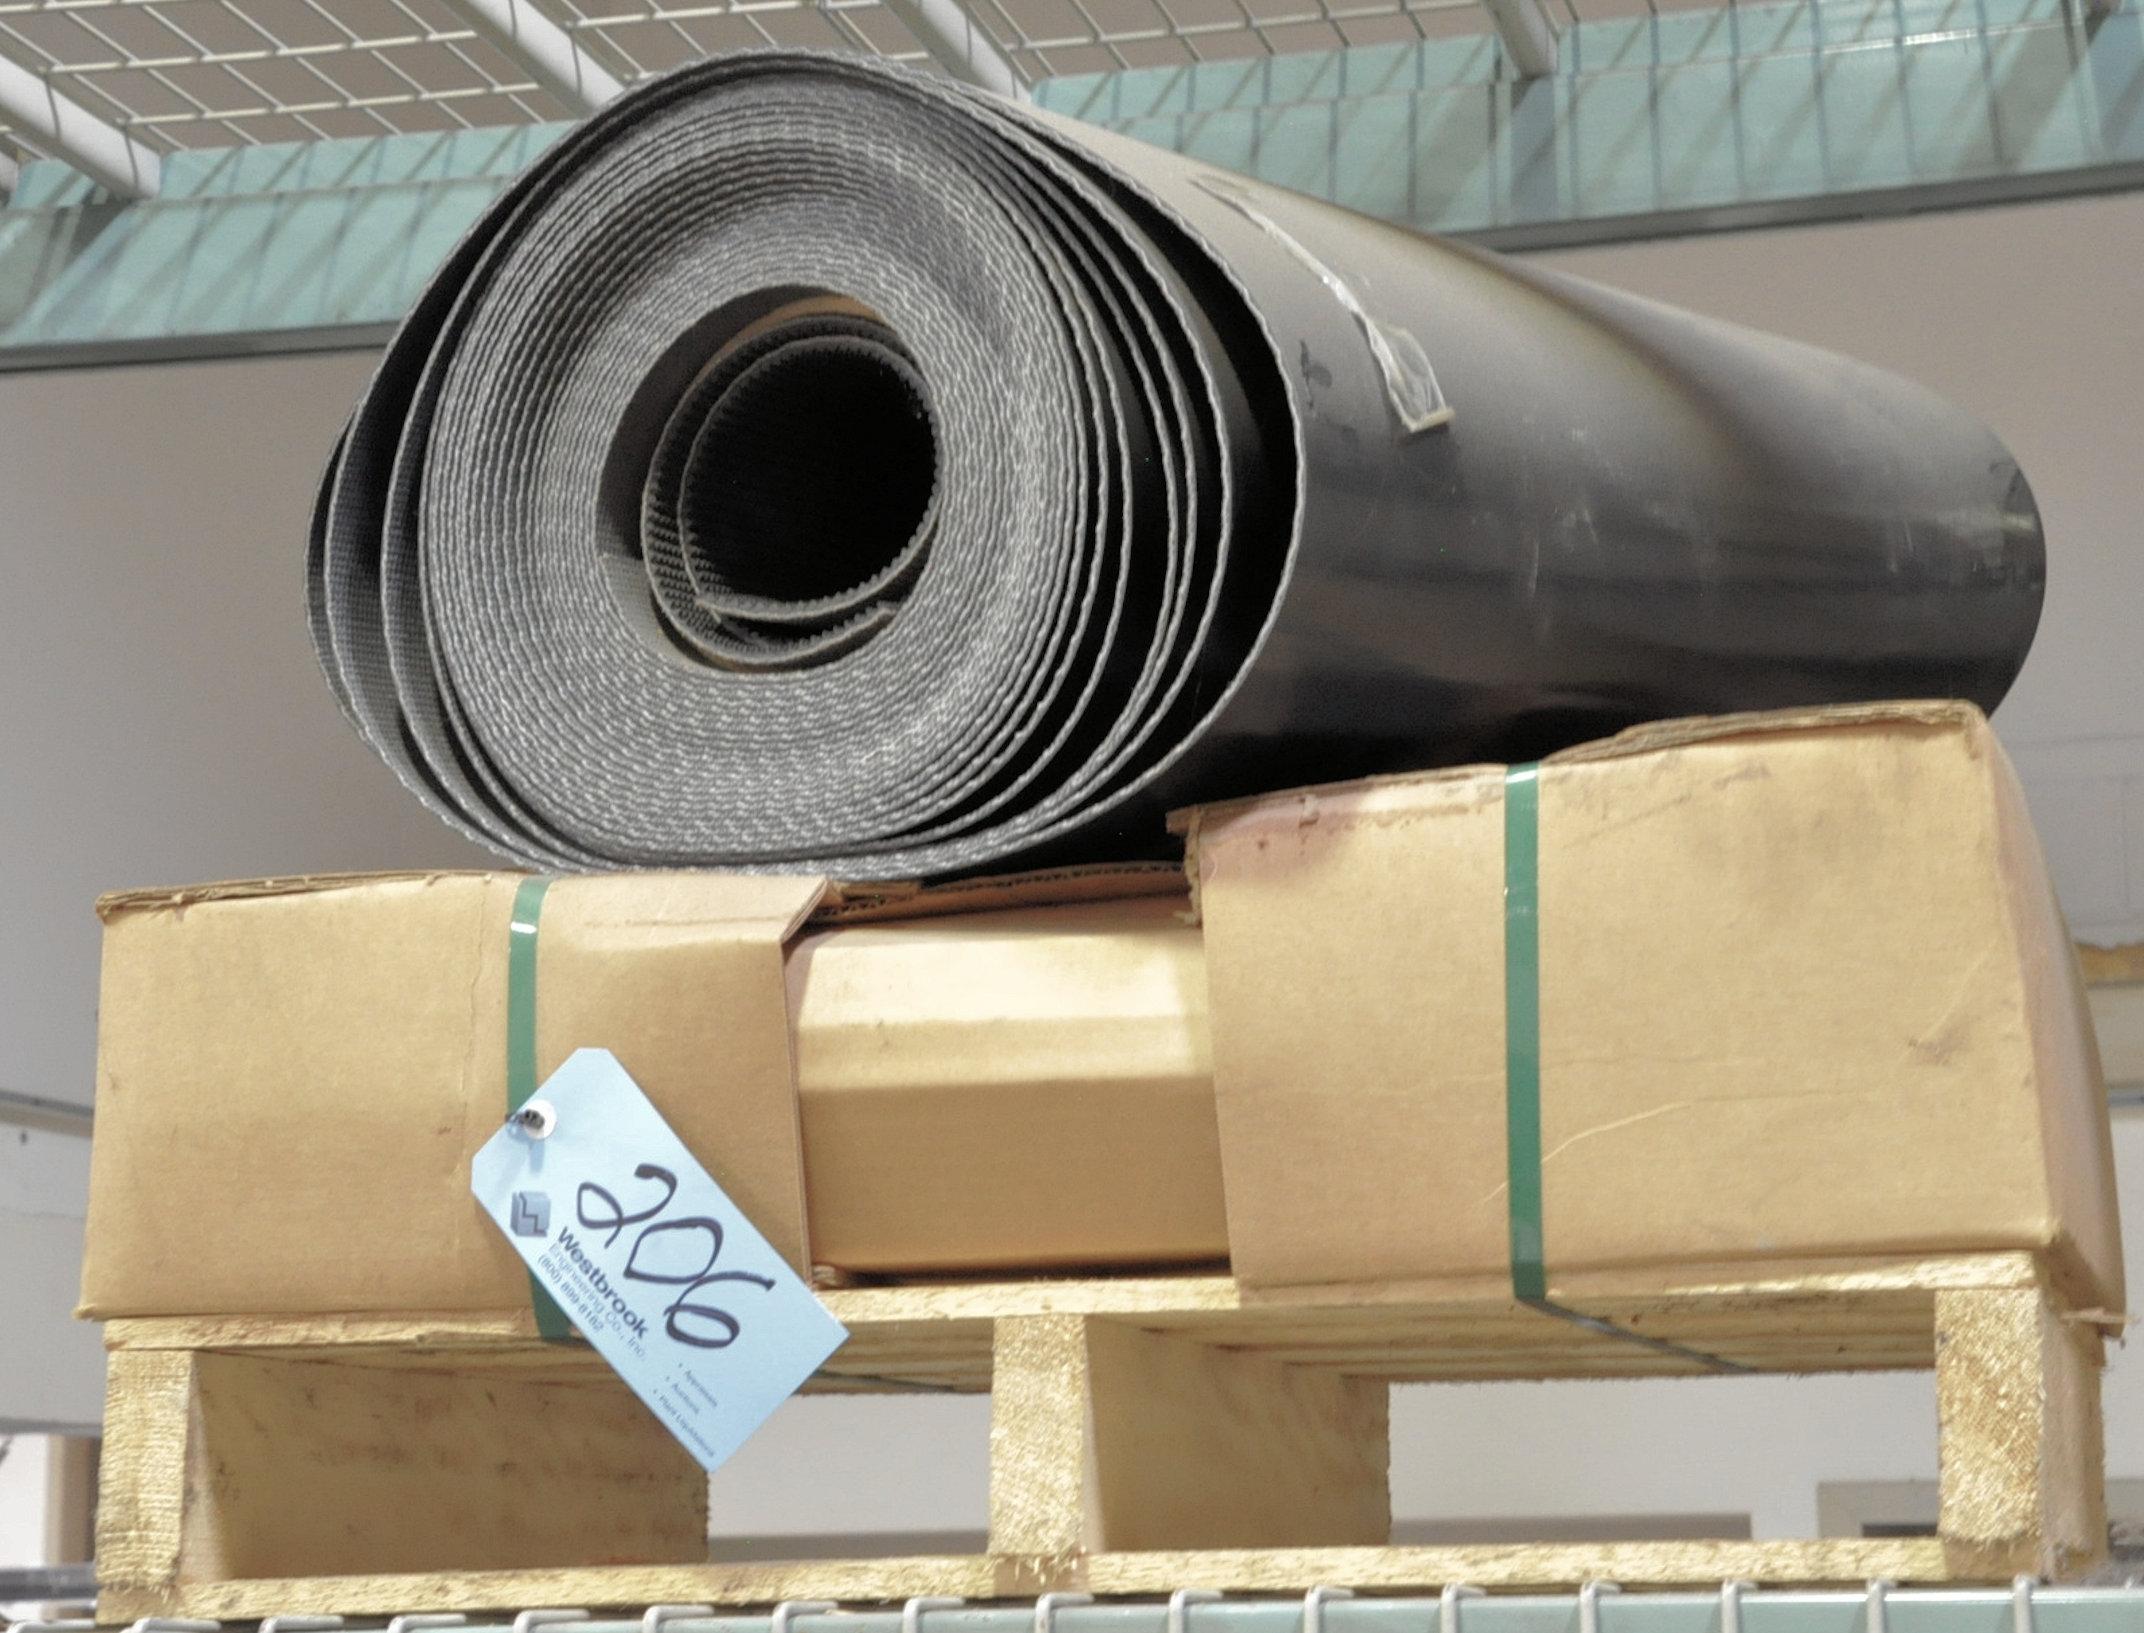 Lot-Conveyor Belt Materials on (1) Pallet